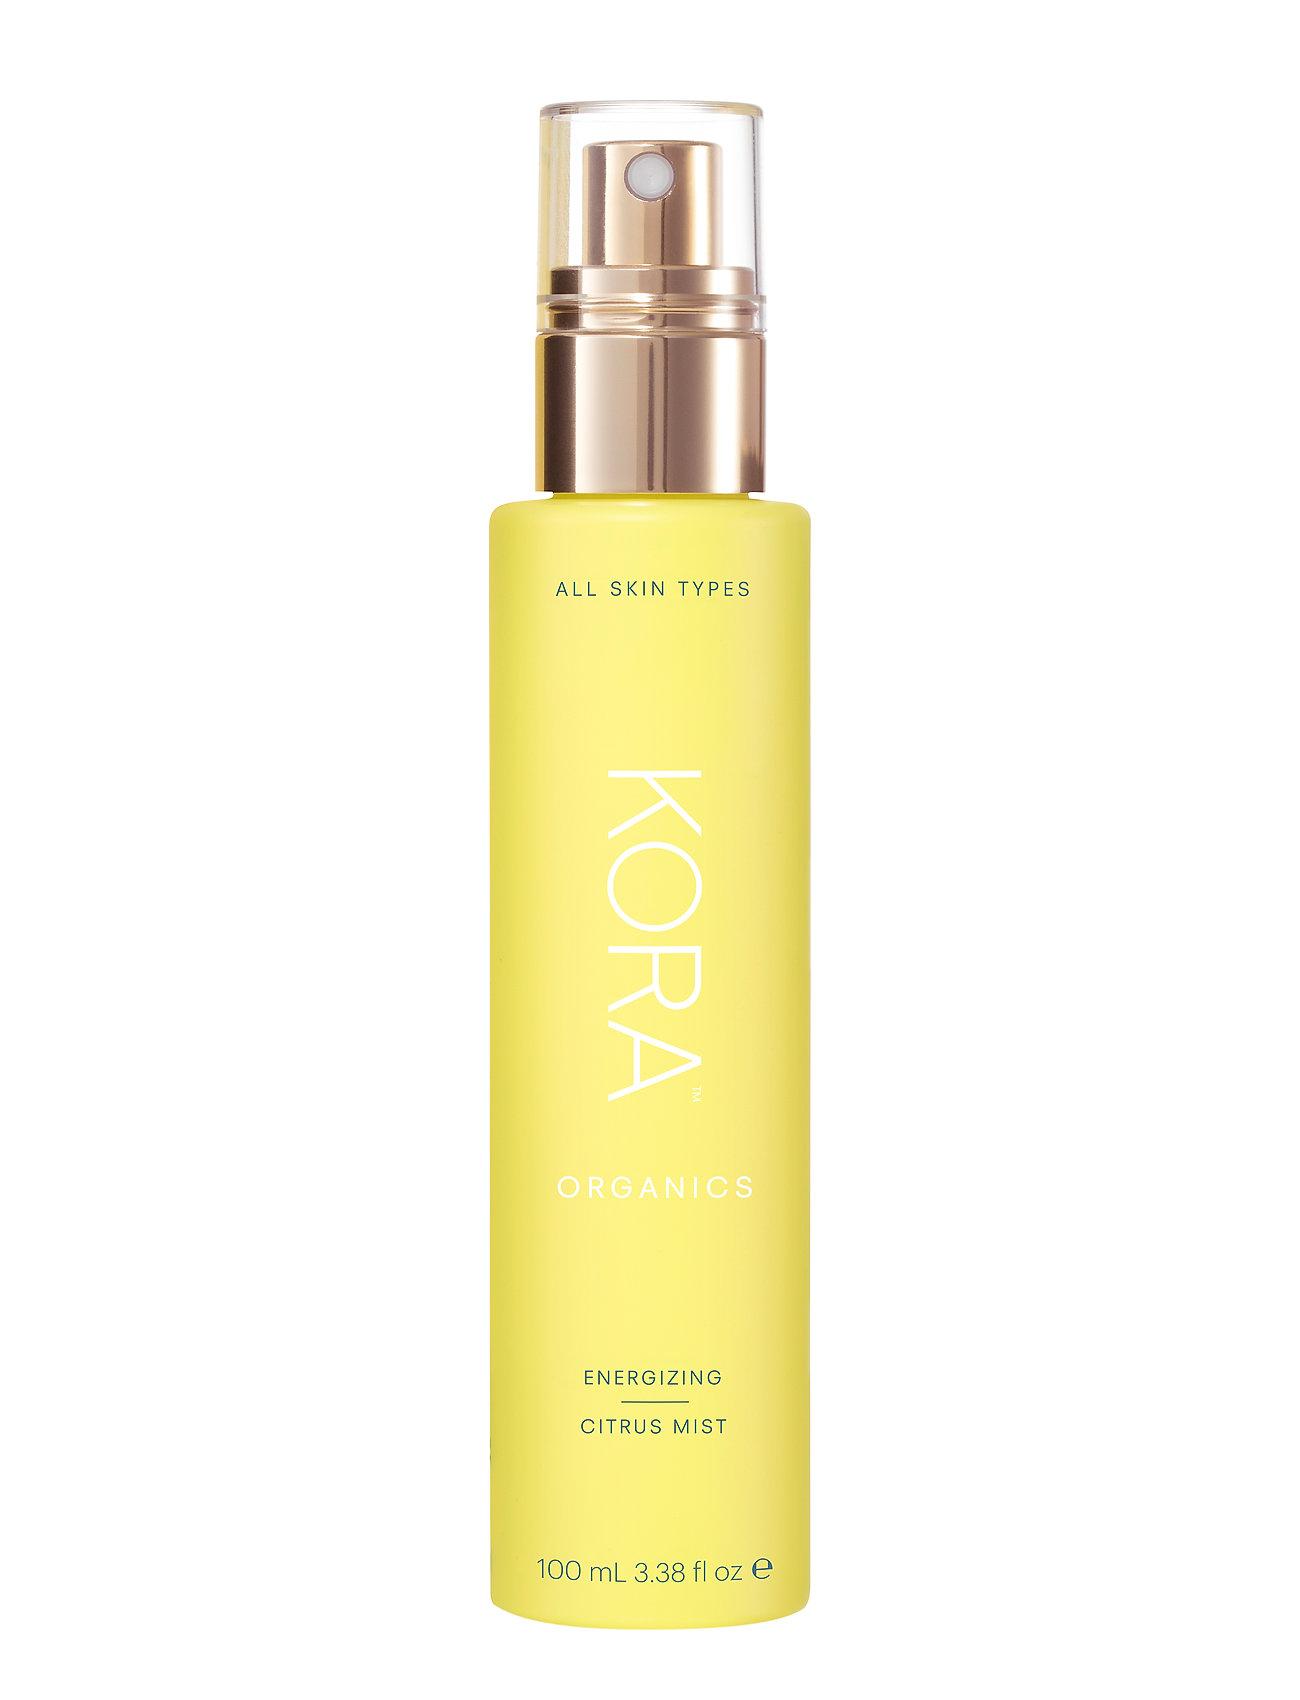 Image of Energizing Citrus Mist Beauty WOMEN Skin Care Face Face Mist Nude Kora Organics (3199488949)